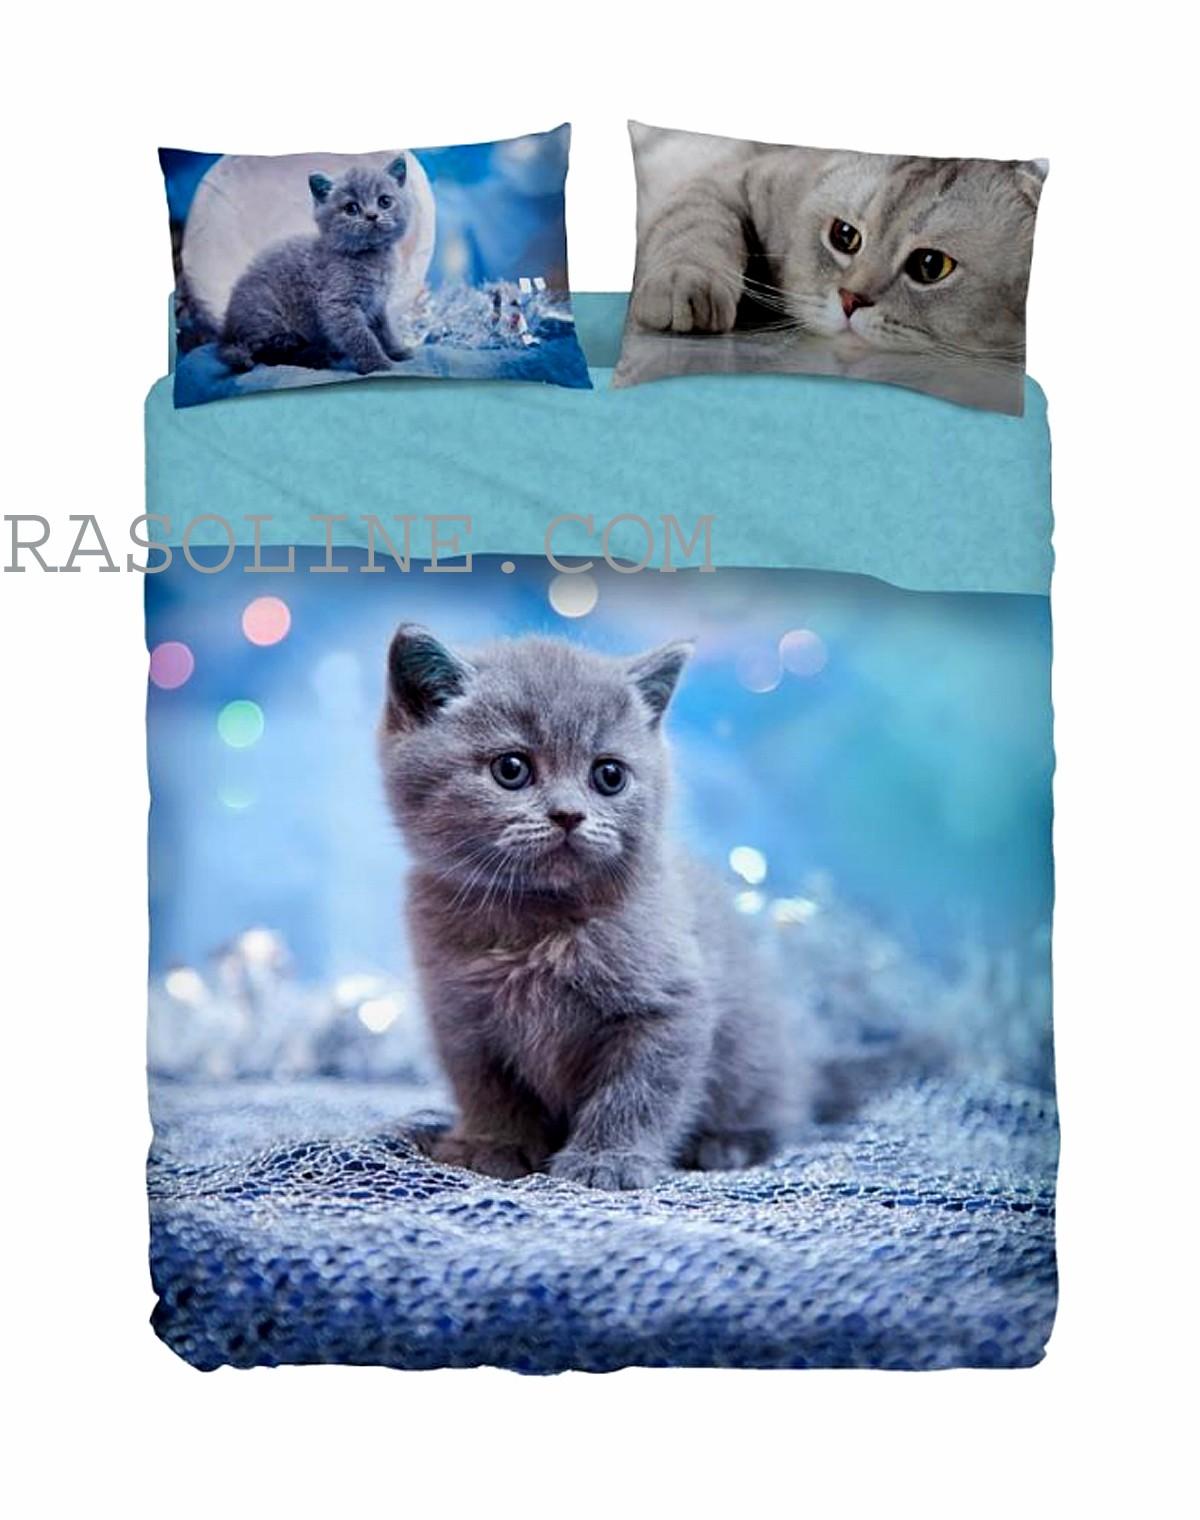 Lenzuola Matrimoniali Bassetti.Complete Bedding Bedspread Double Softness Kitten Blue Bassetti Ebay